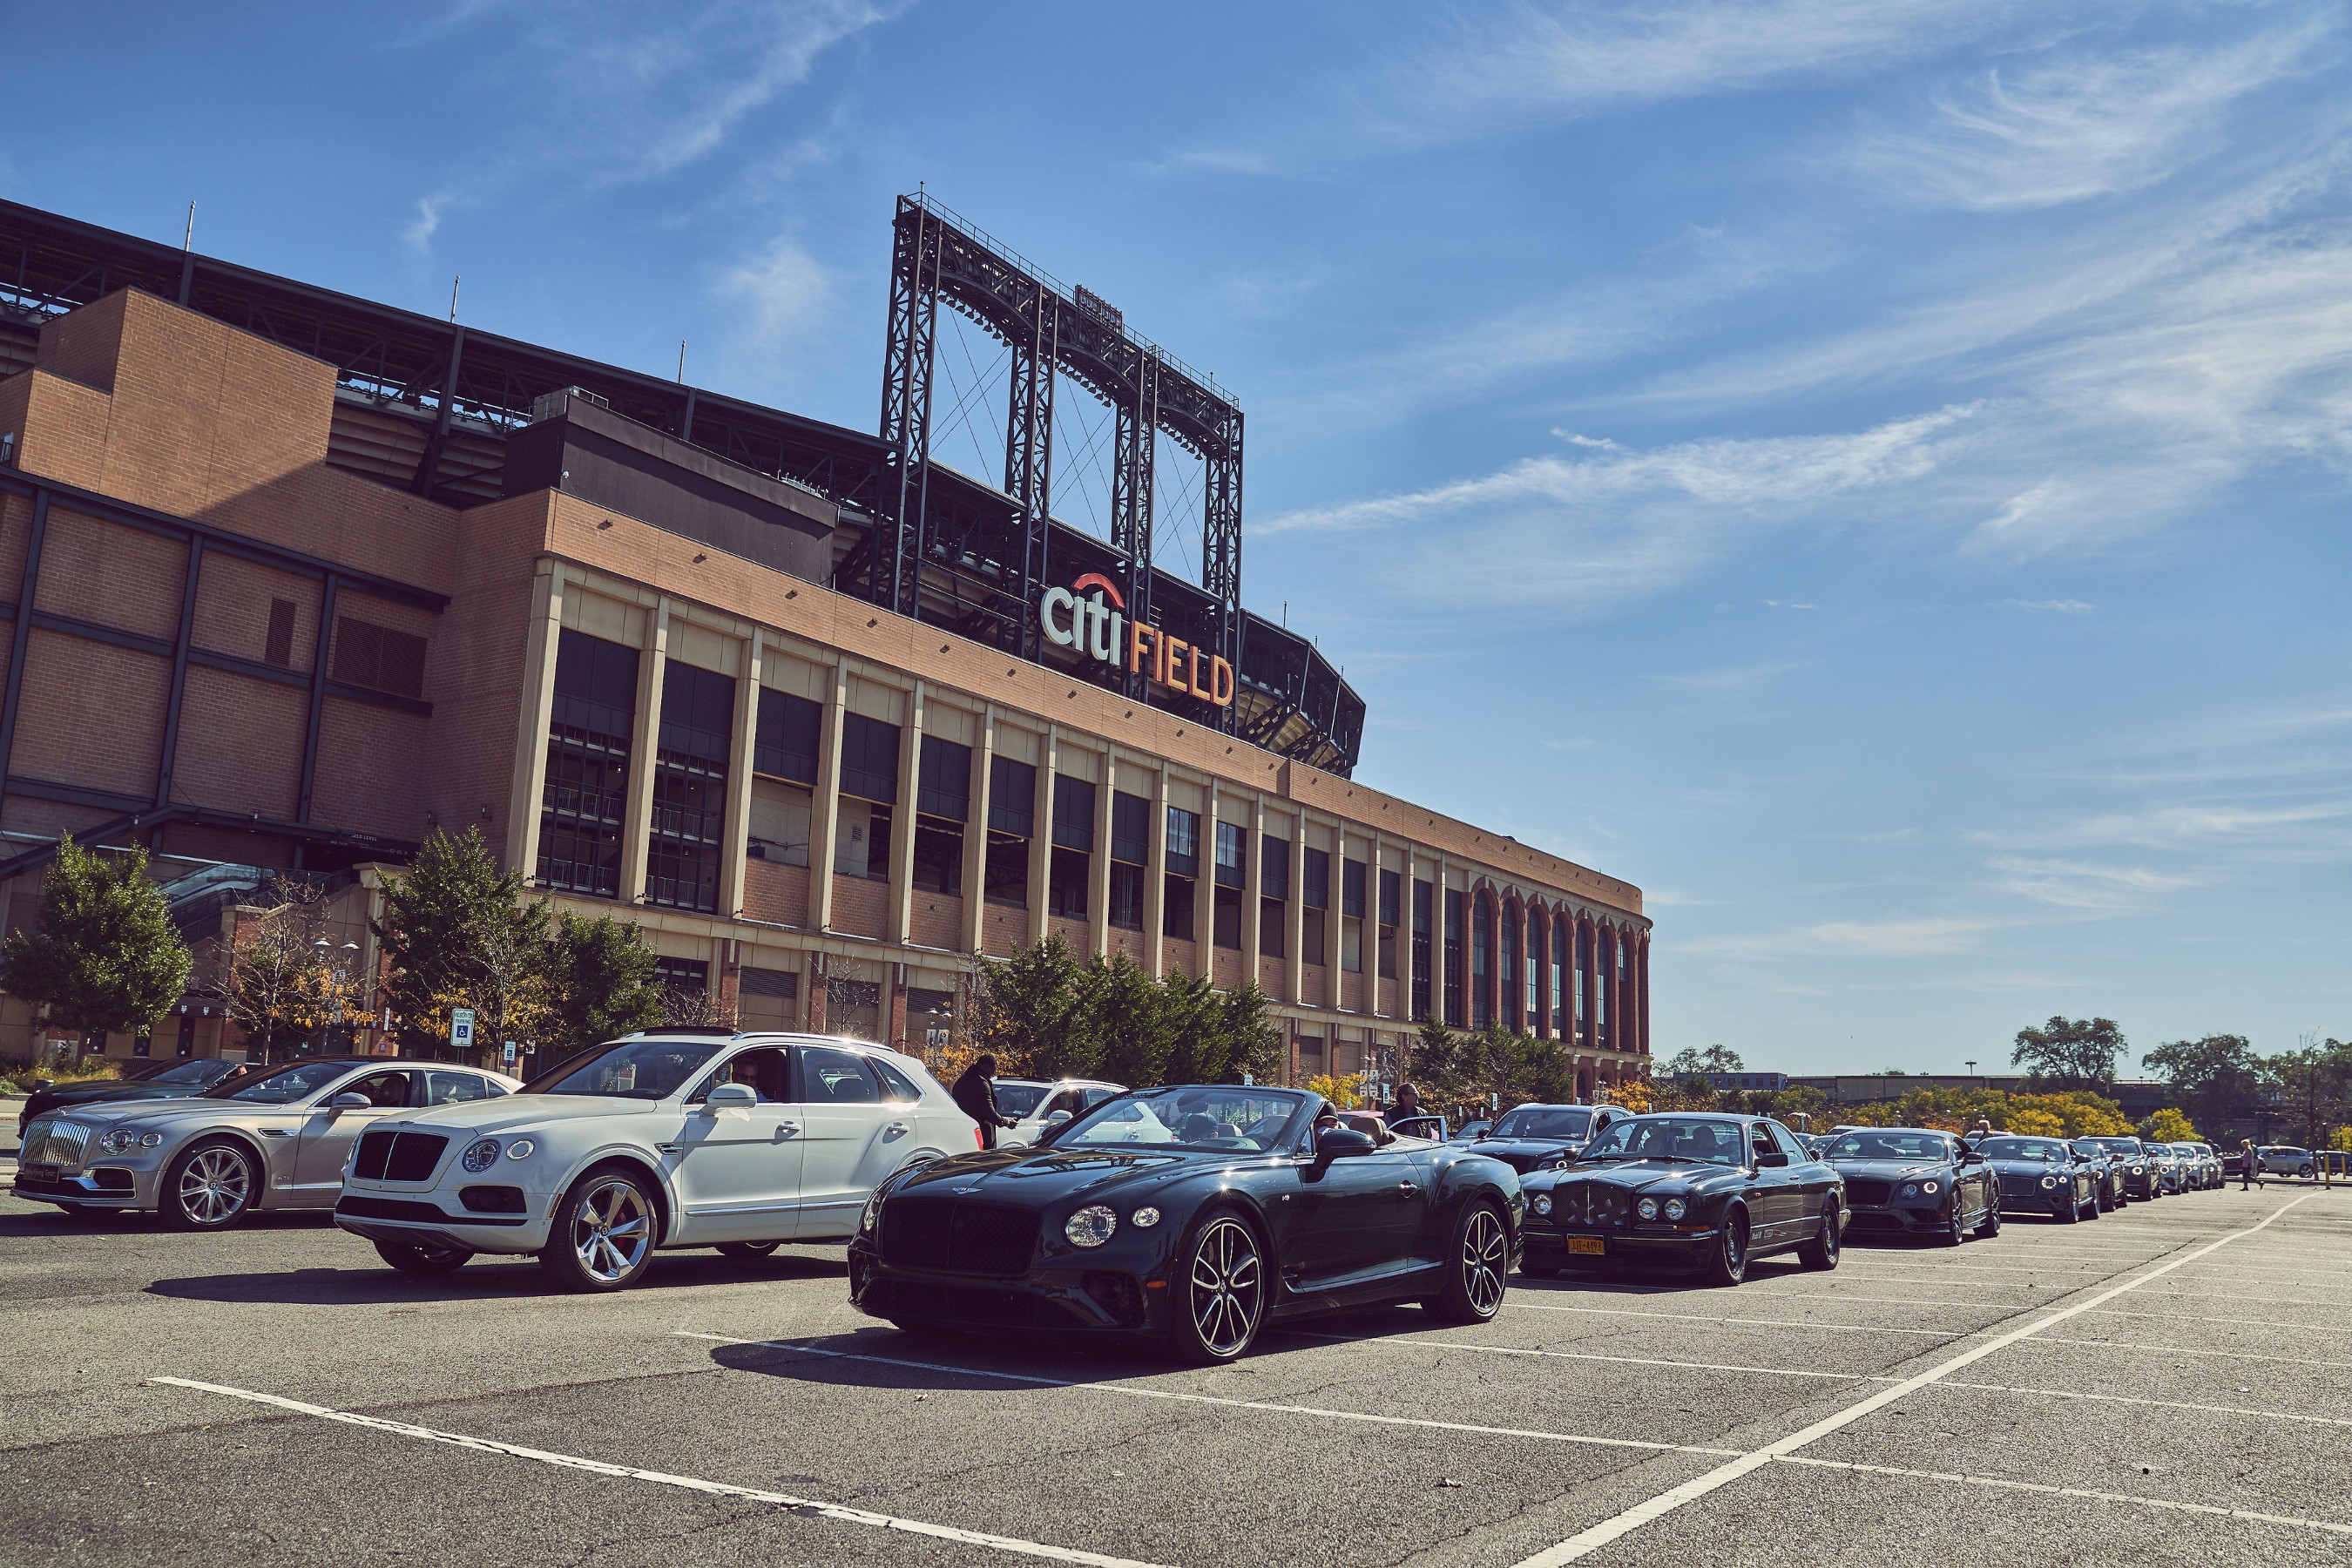 Bentley Centenary Celebration Captivates New York City